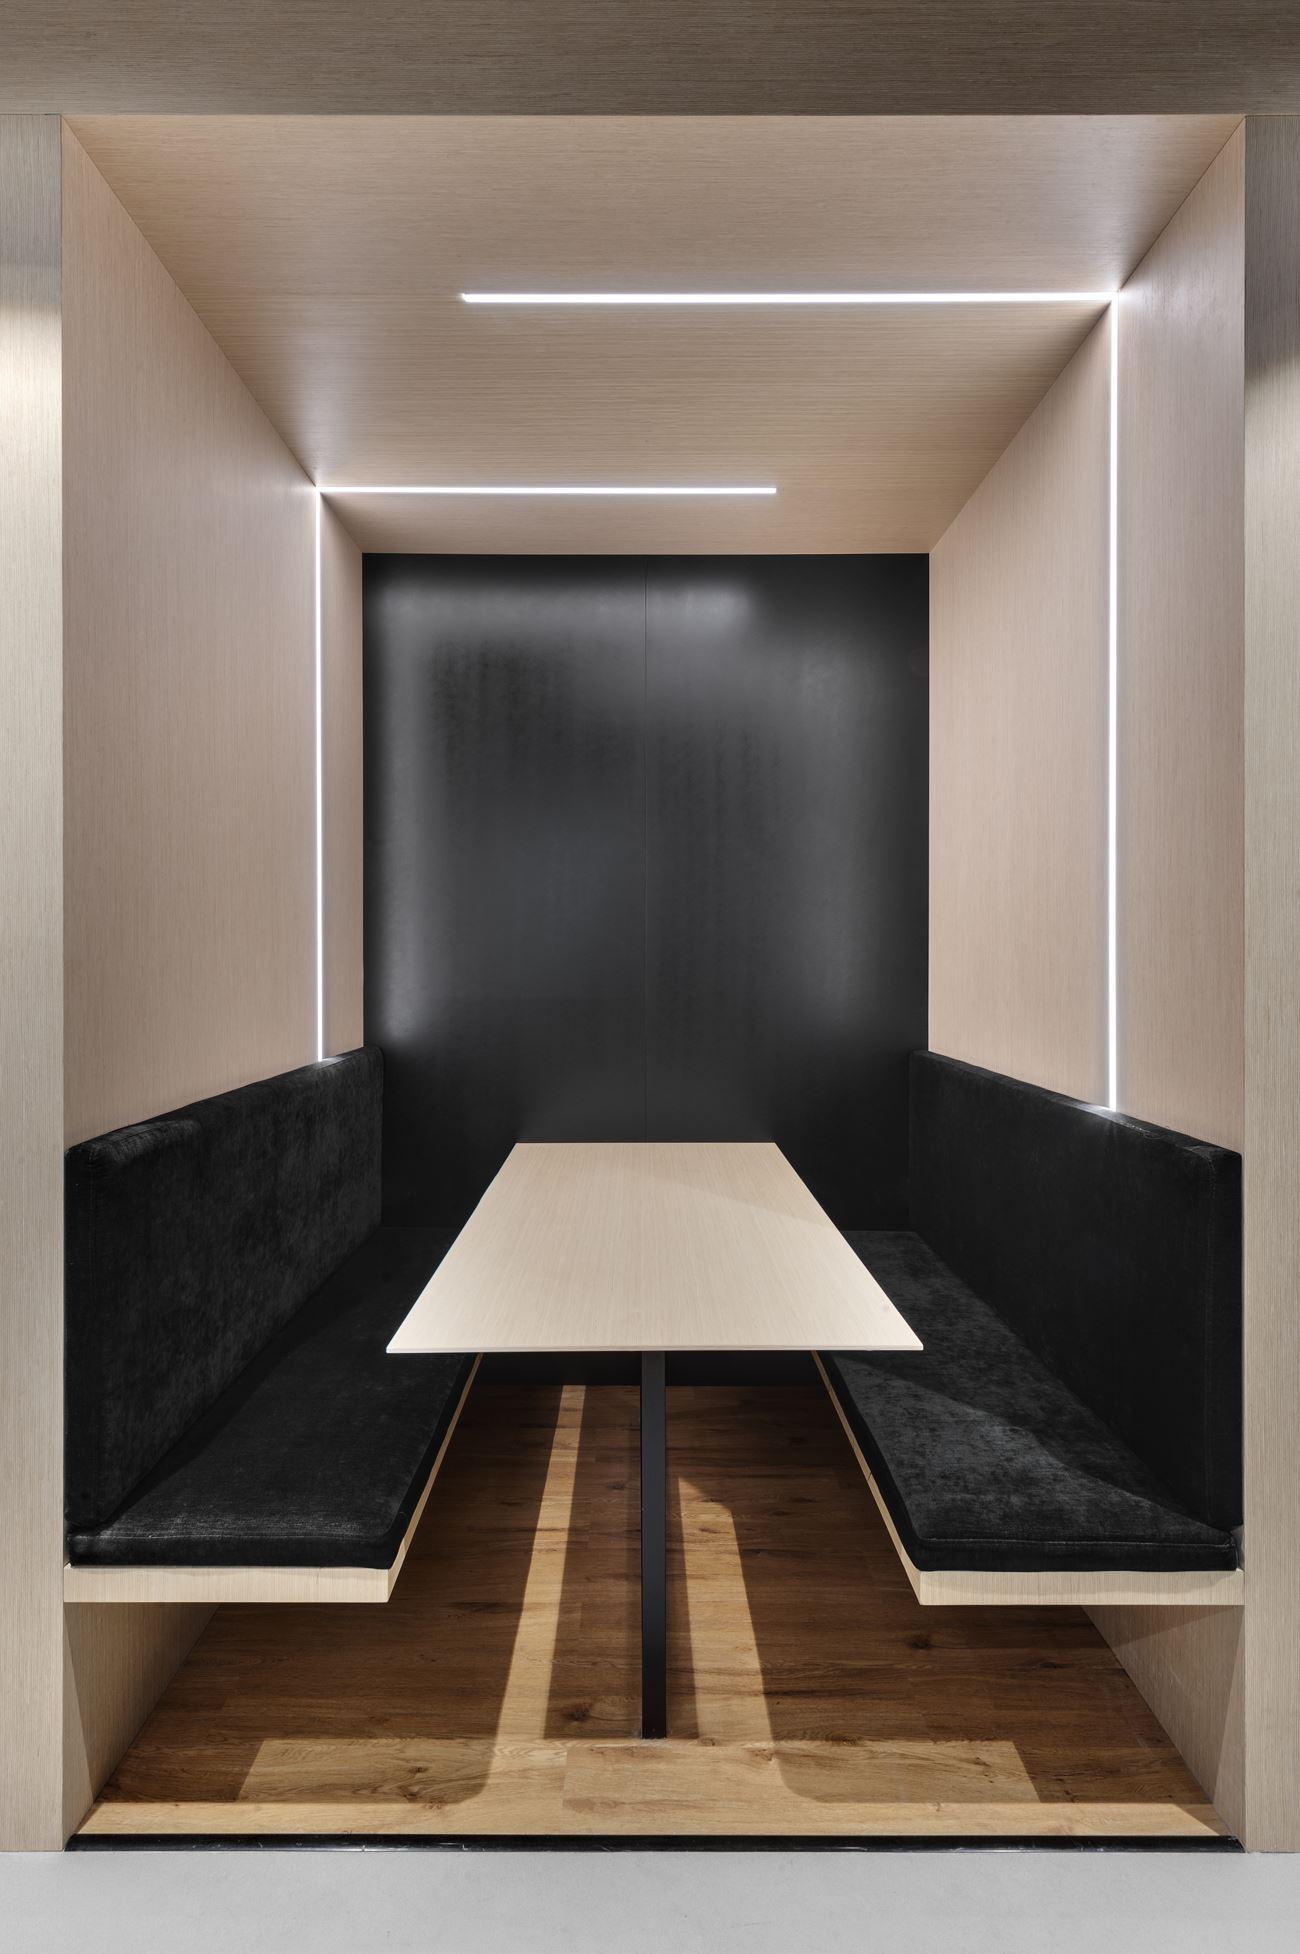 Innovation Offices קירות פינת הישיבה בתאורה מיוחדת הנעשה על ידי קמחי דורי